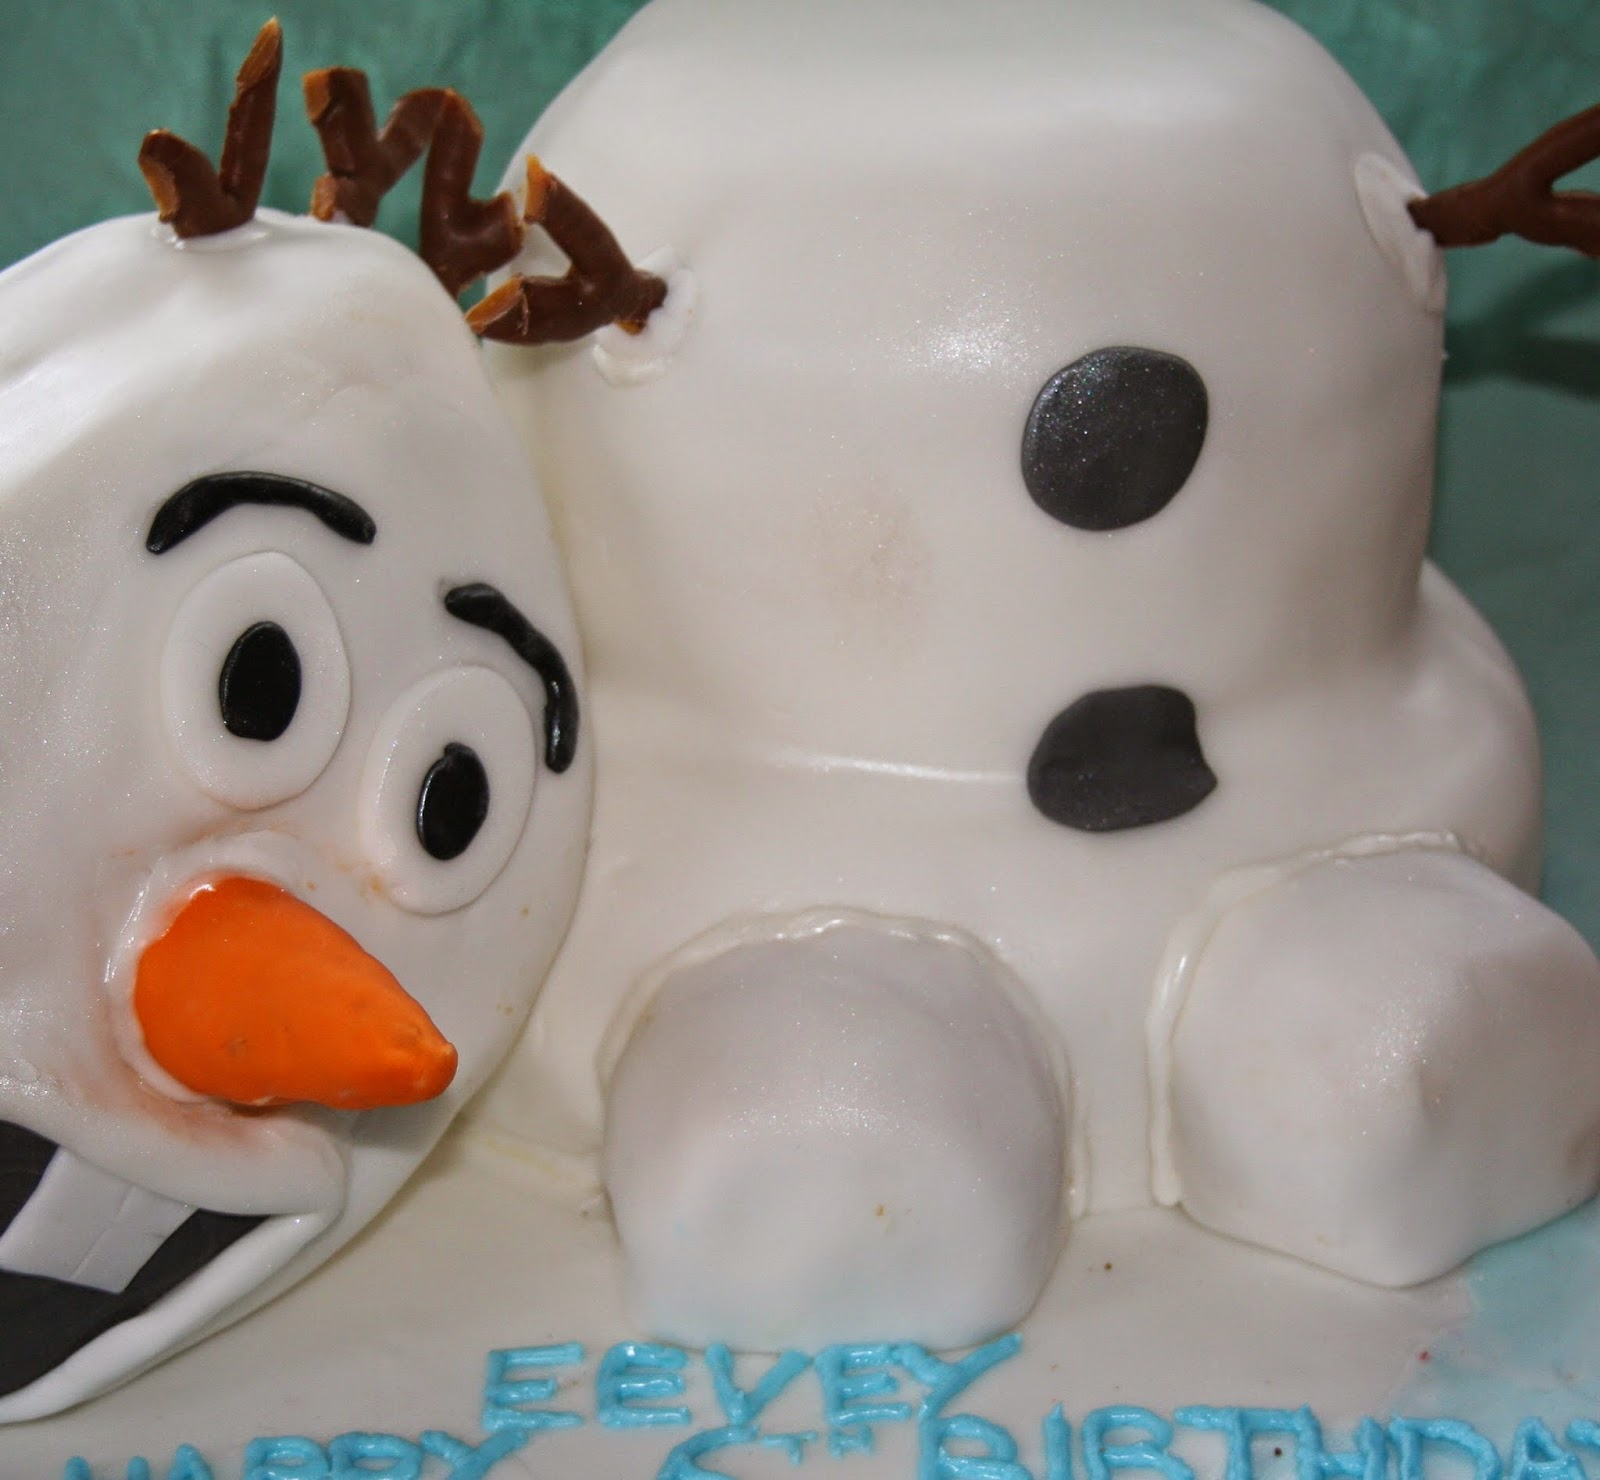 Wondrous Chintzy Cakes Olaf Birthday Cake Birthday Cards Printable Inklcafe Filternl